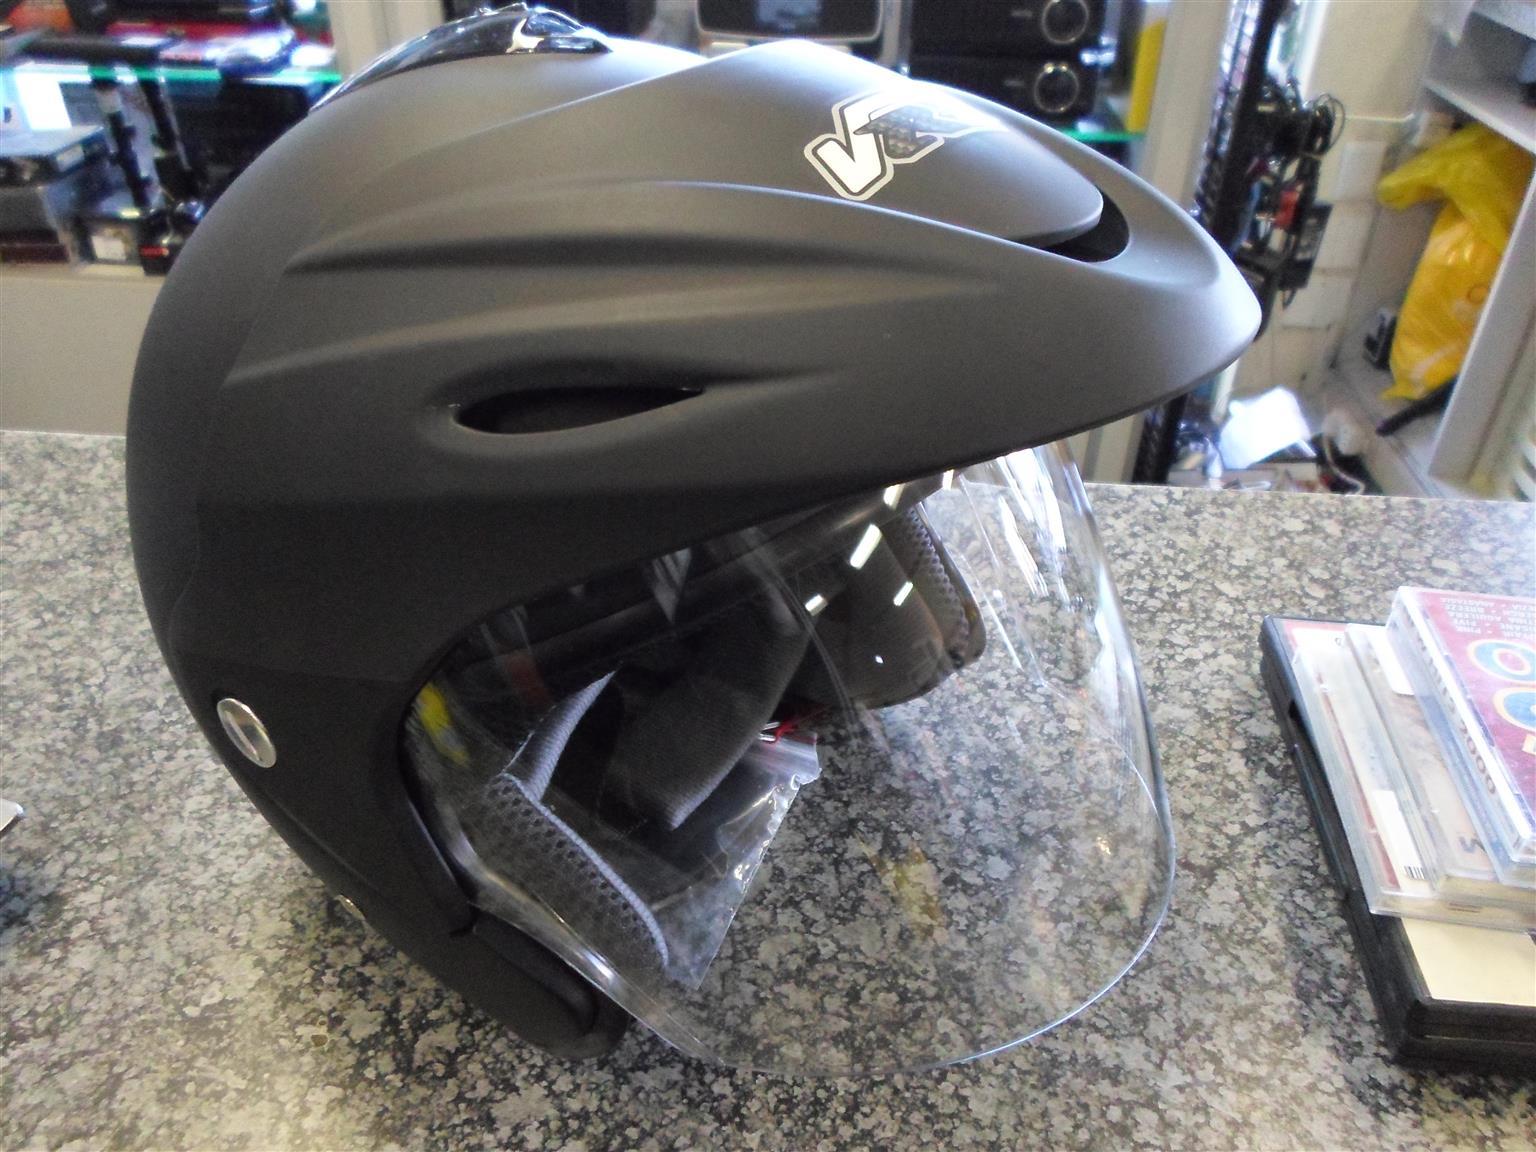 XXL VR-1 Helmet